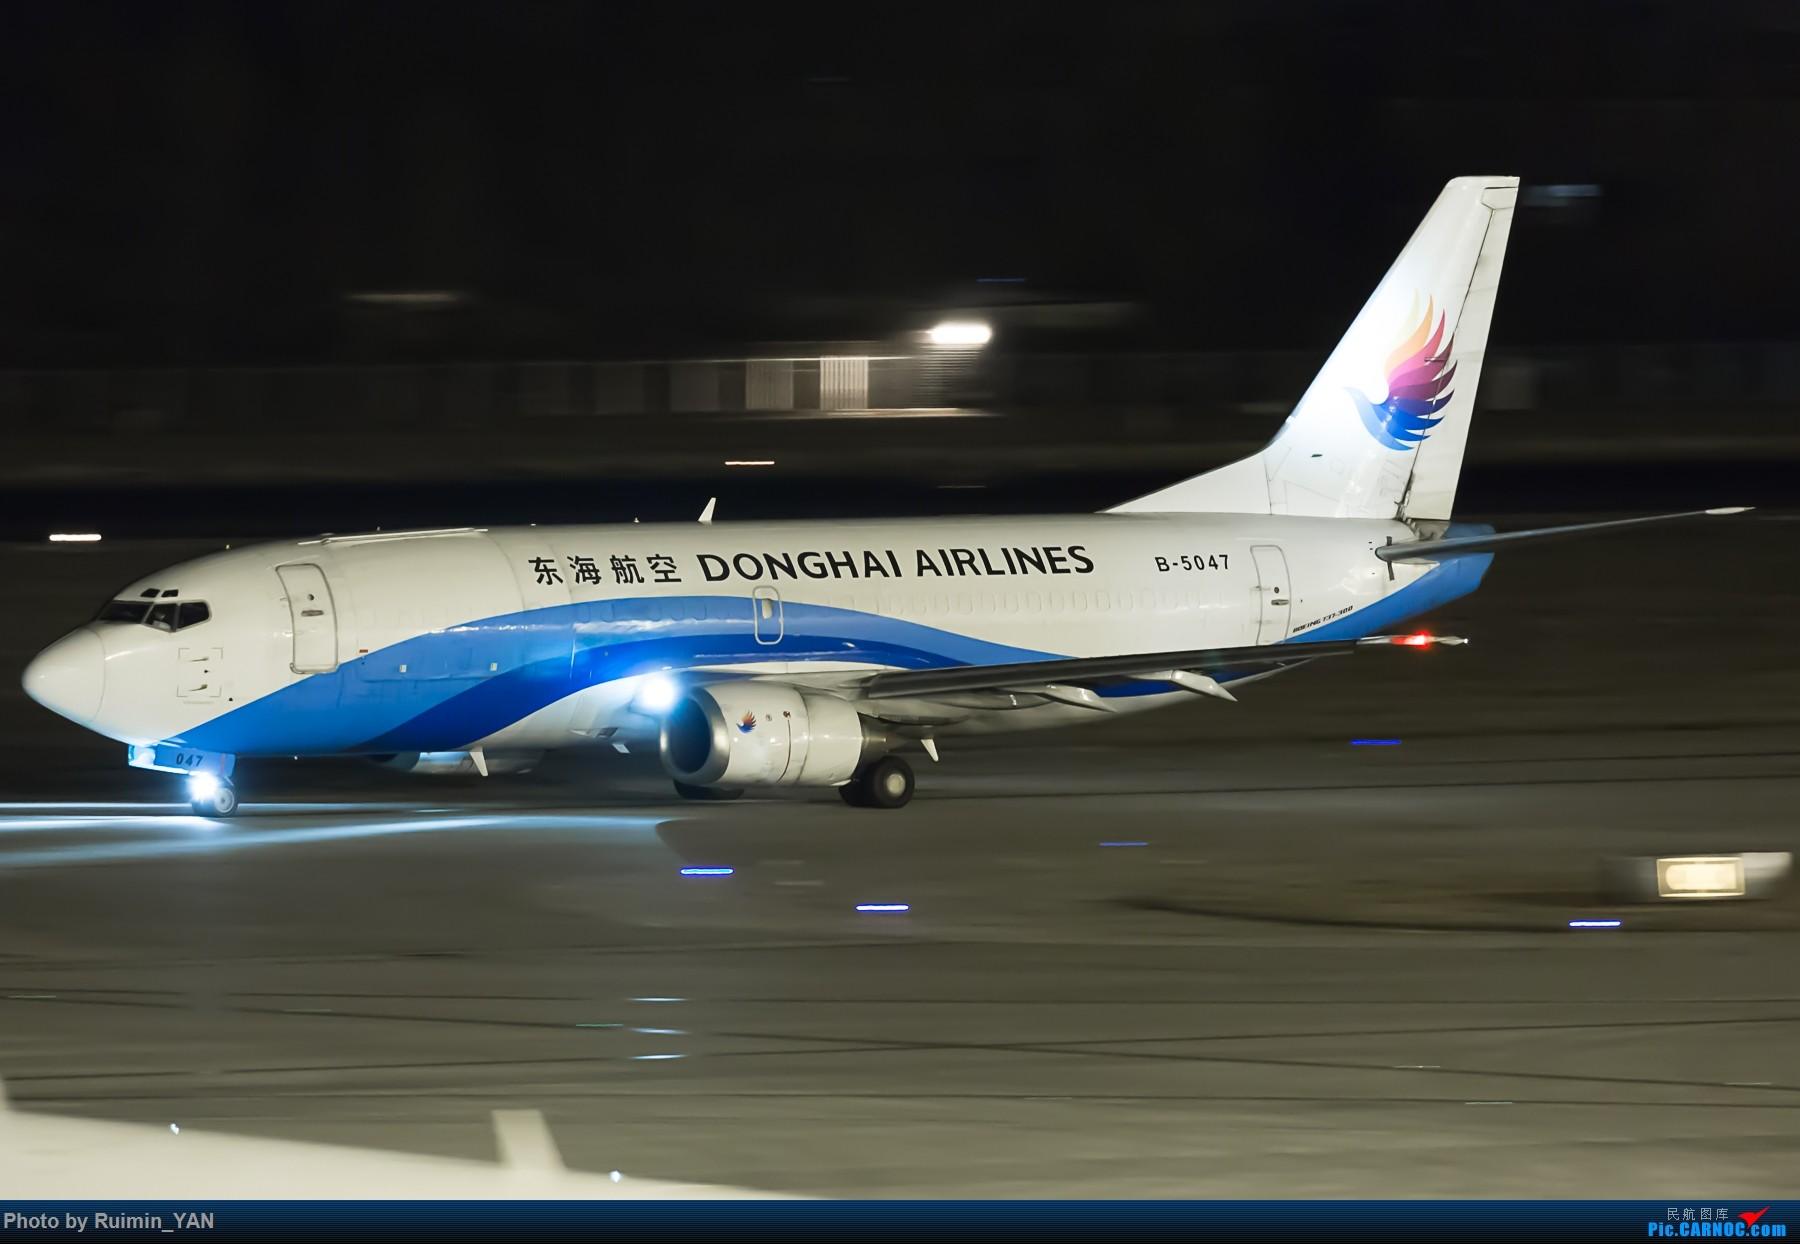 【PEK】【夜景】【卡狗】东海航空(DZ) B-5047 B733